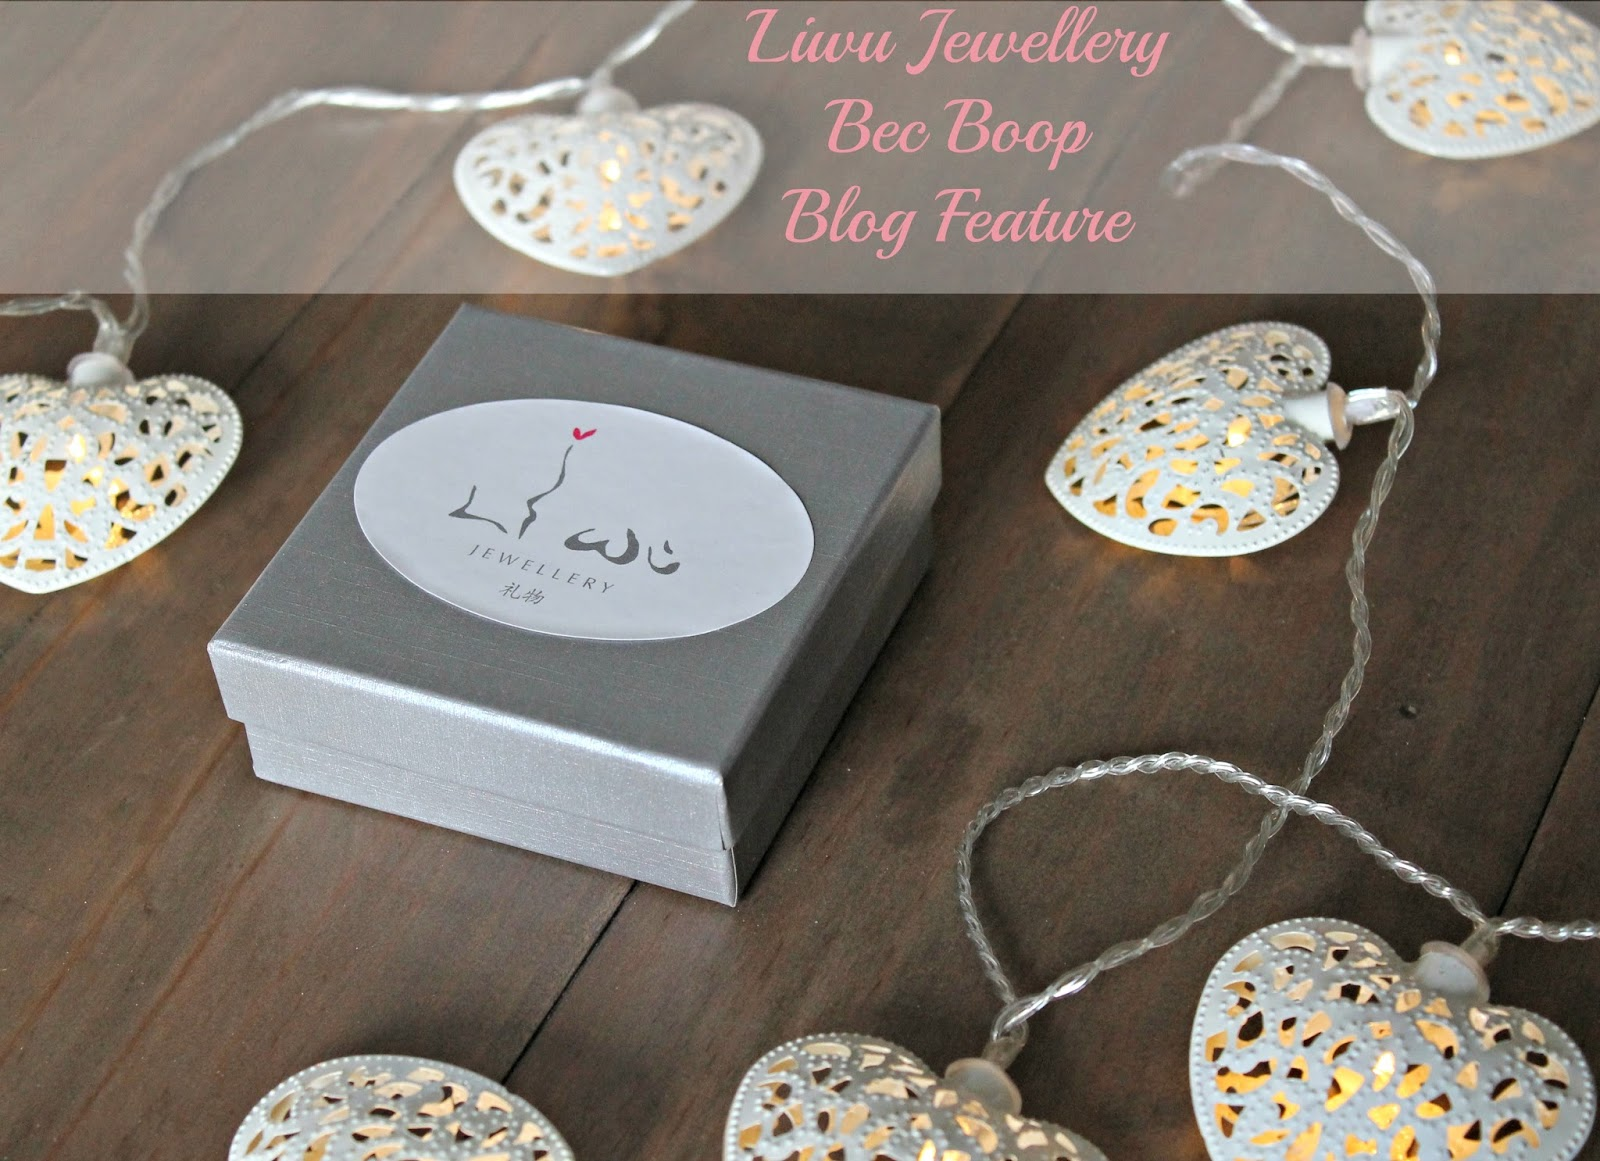 Liwu Jewellery Ireland Blog Review